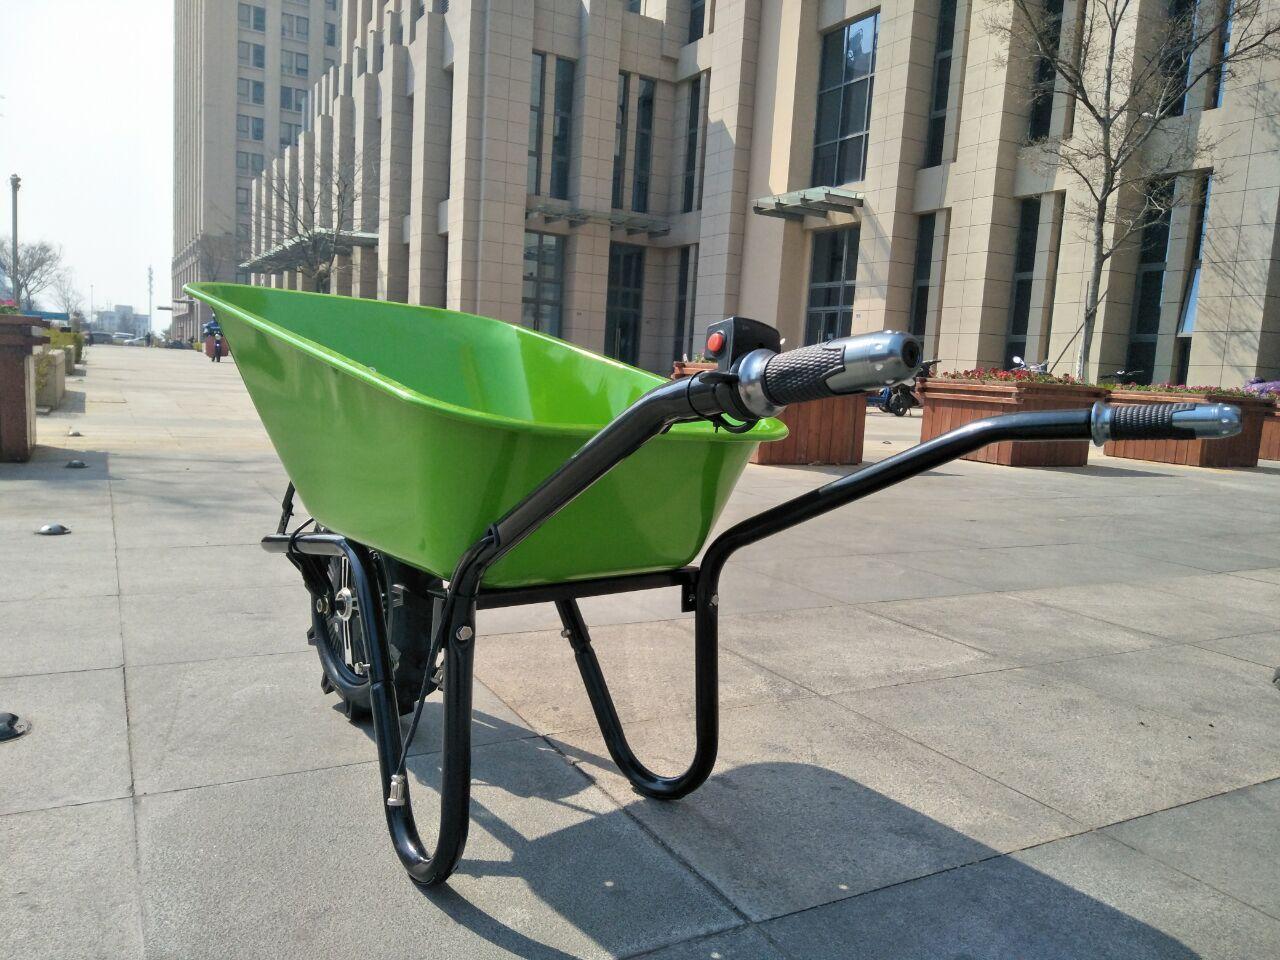 Electrical Heavy Duty Strong Wheel Barrow With Single Wheel Wheelbarrow Aluminum Furniture Durable